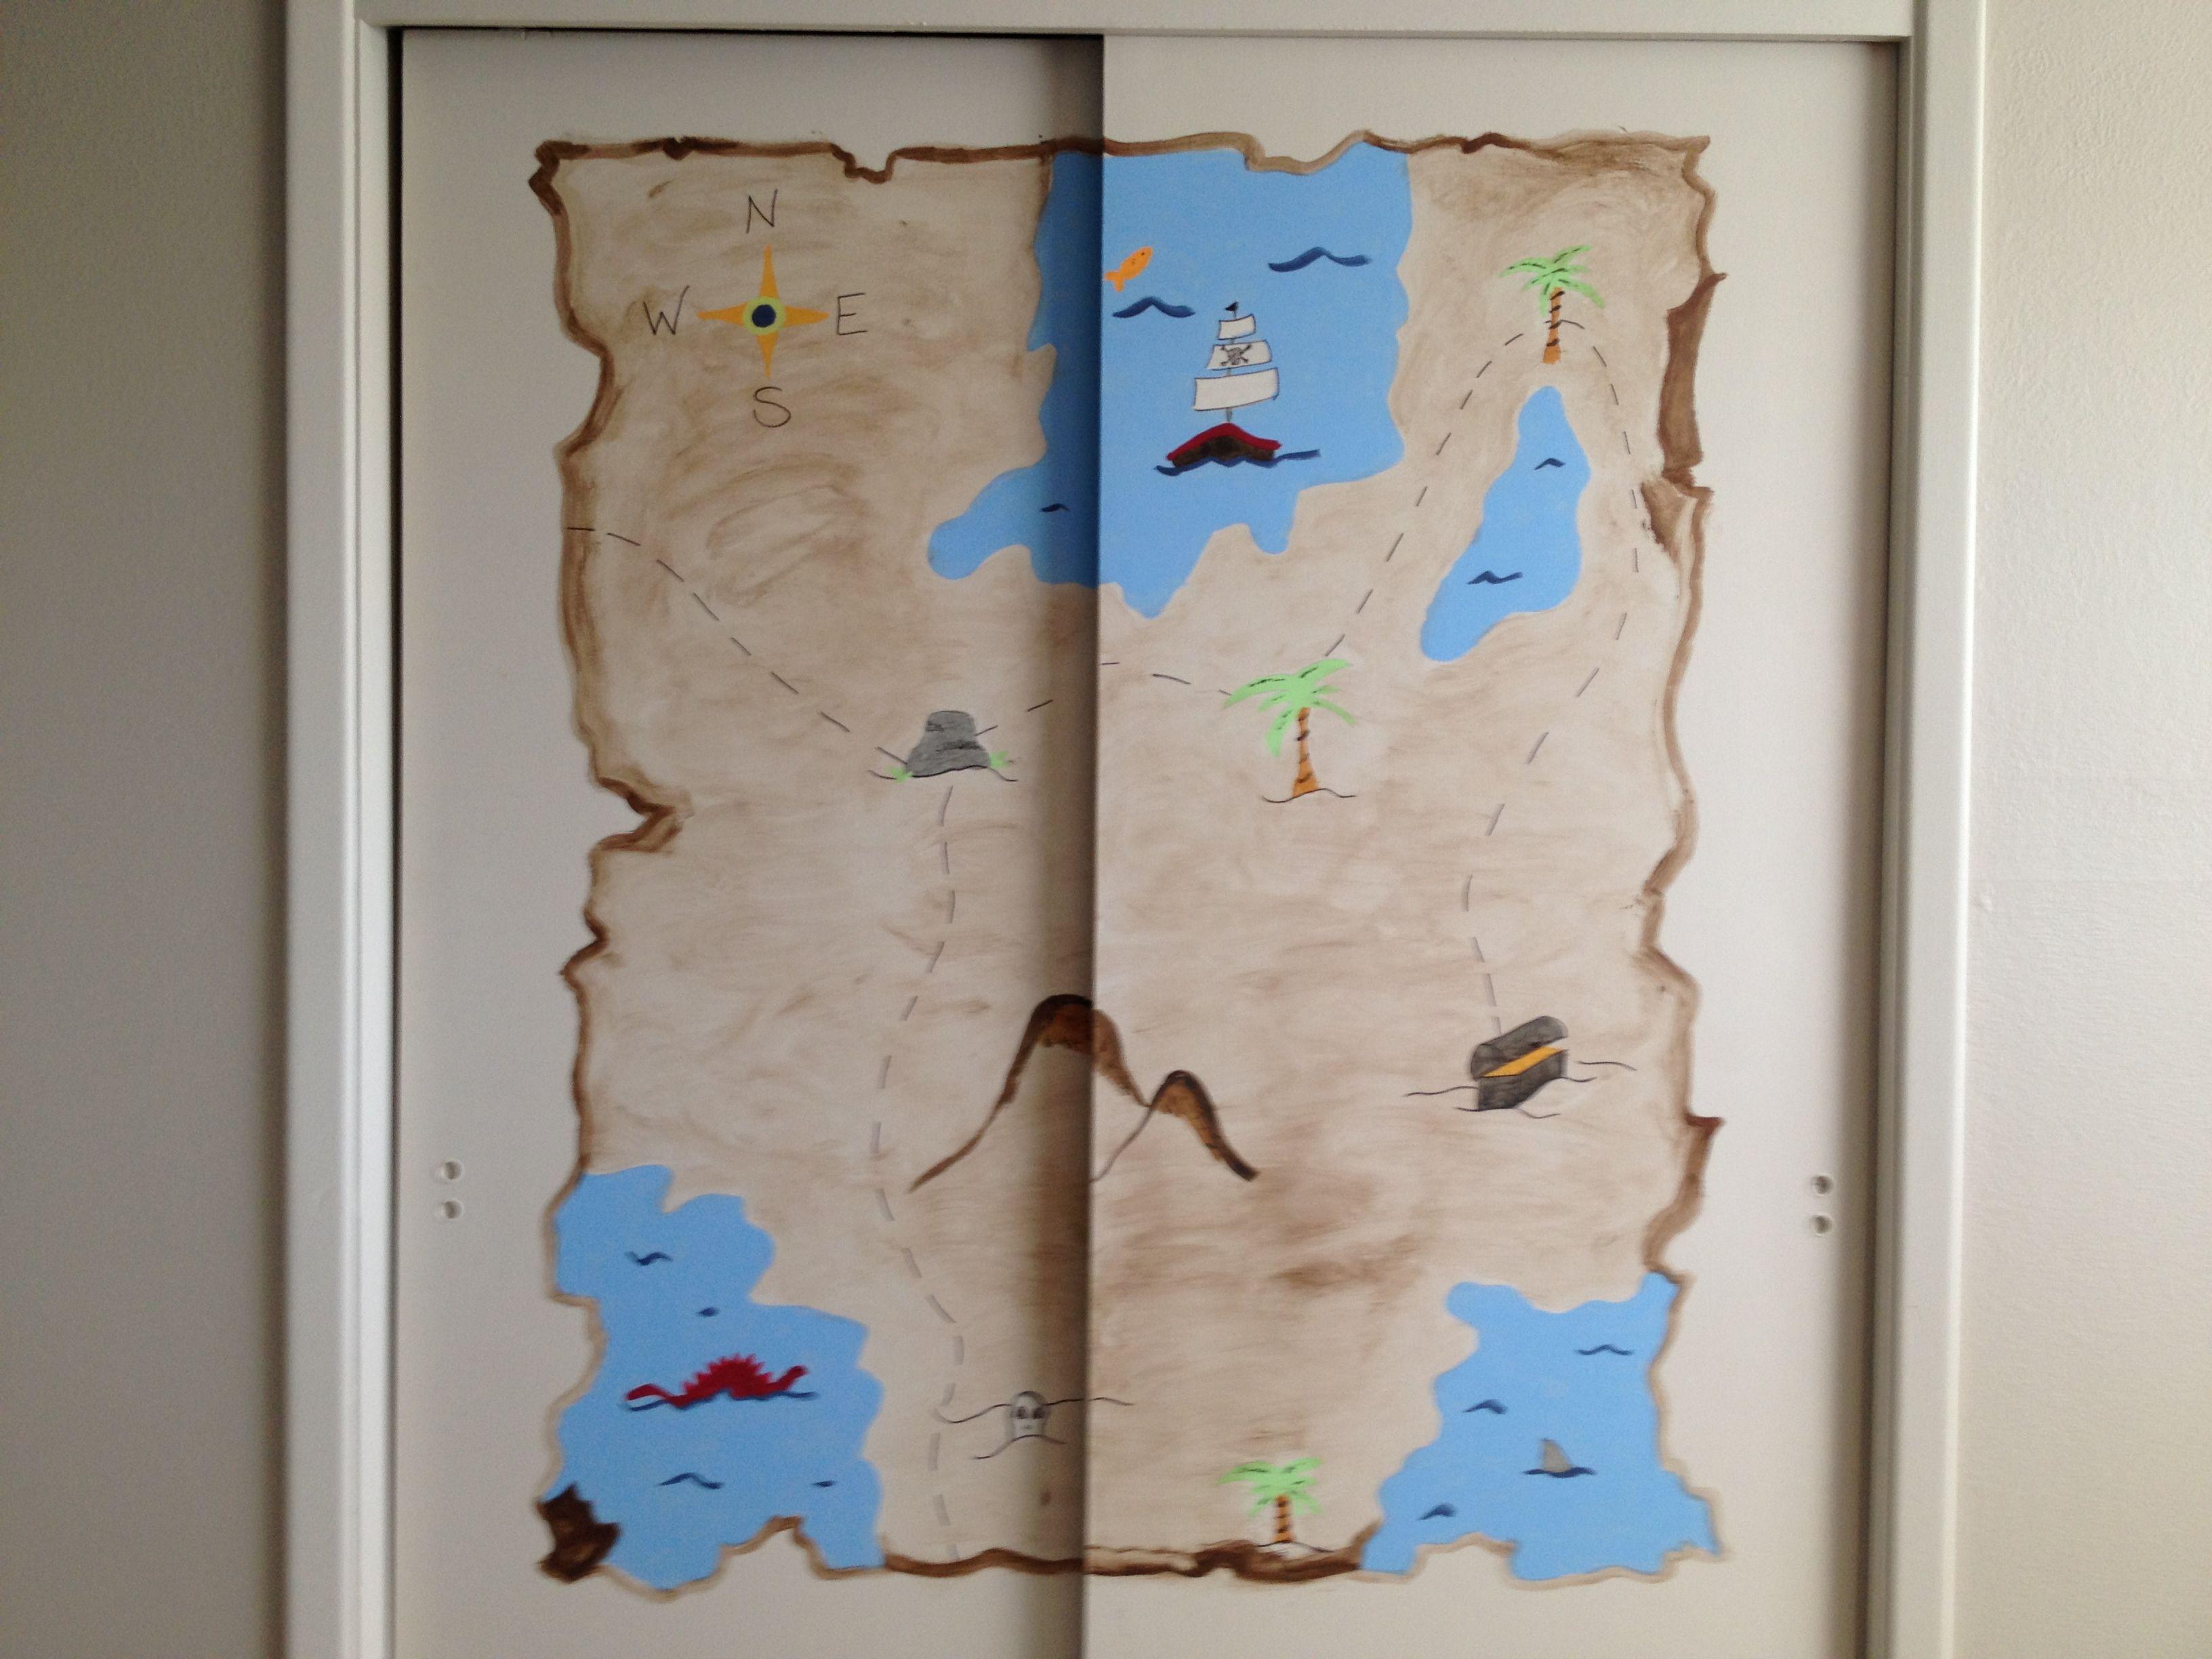 Treasure map closet door mural Ideas for the kiddos